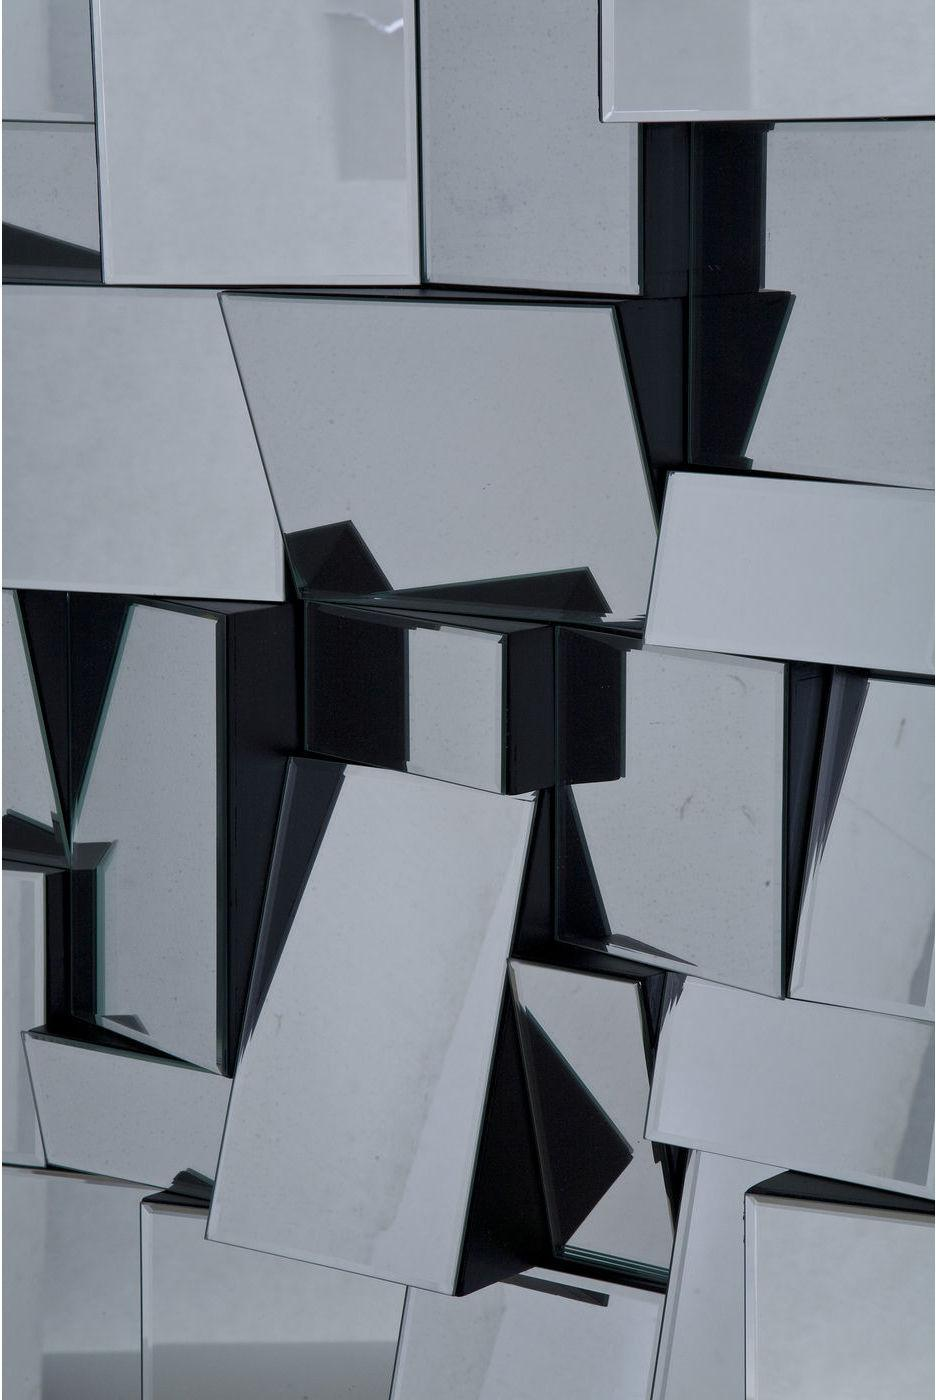 kare design spiegel involuto 120x80 meubelen verlichting. Black Bedroom Furniture Sets. Home Design Ideas